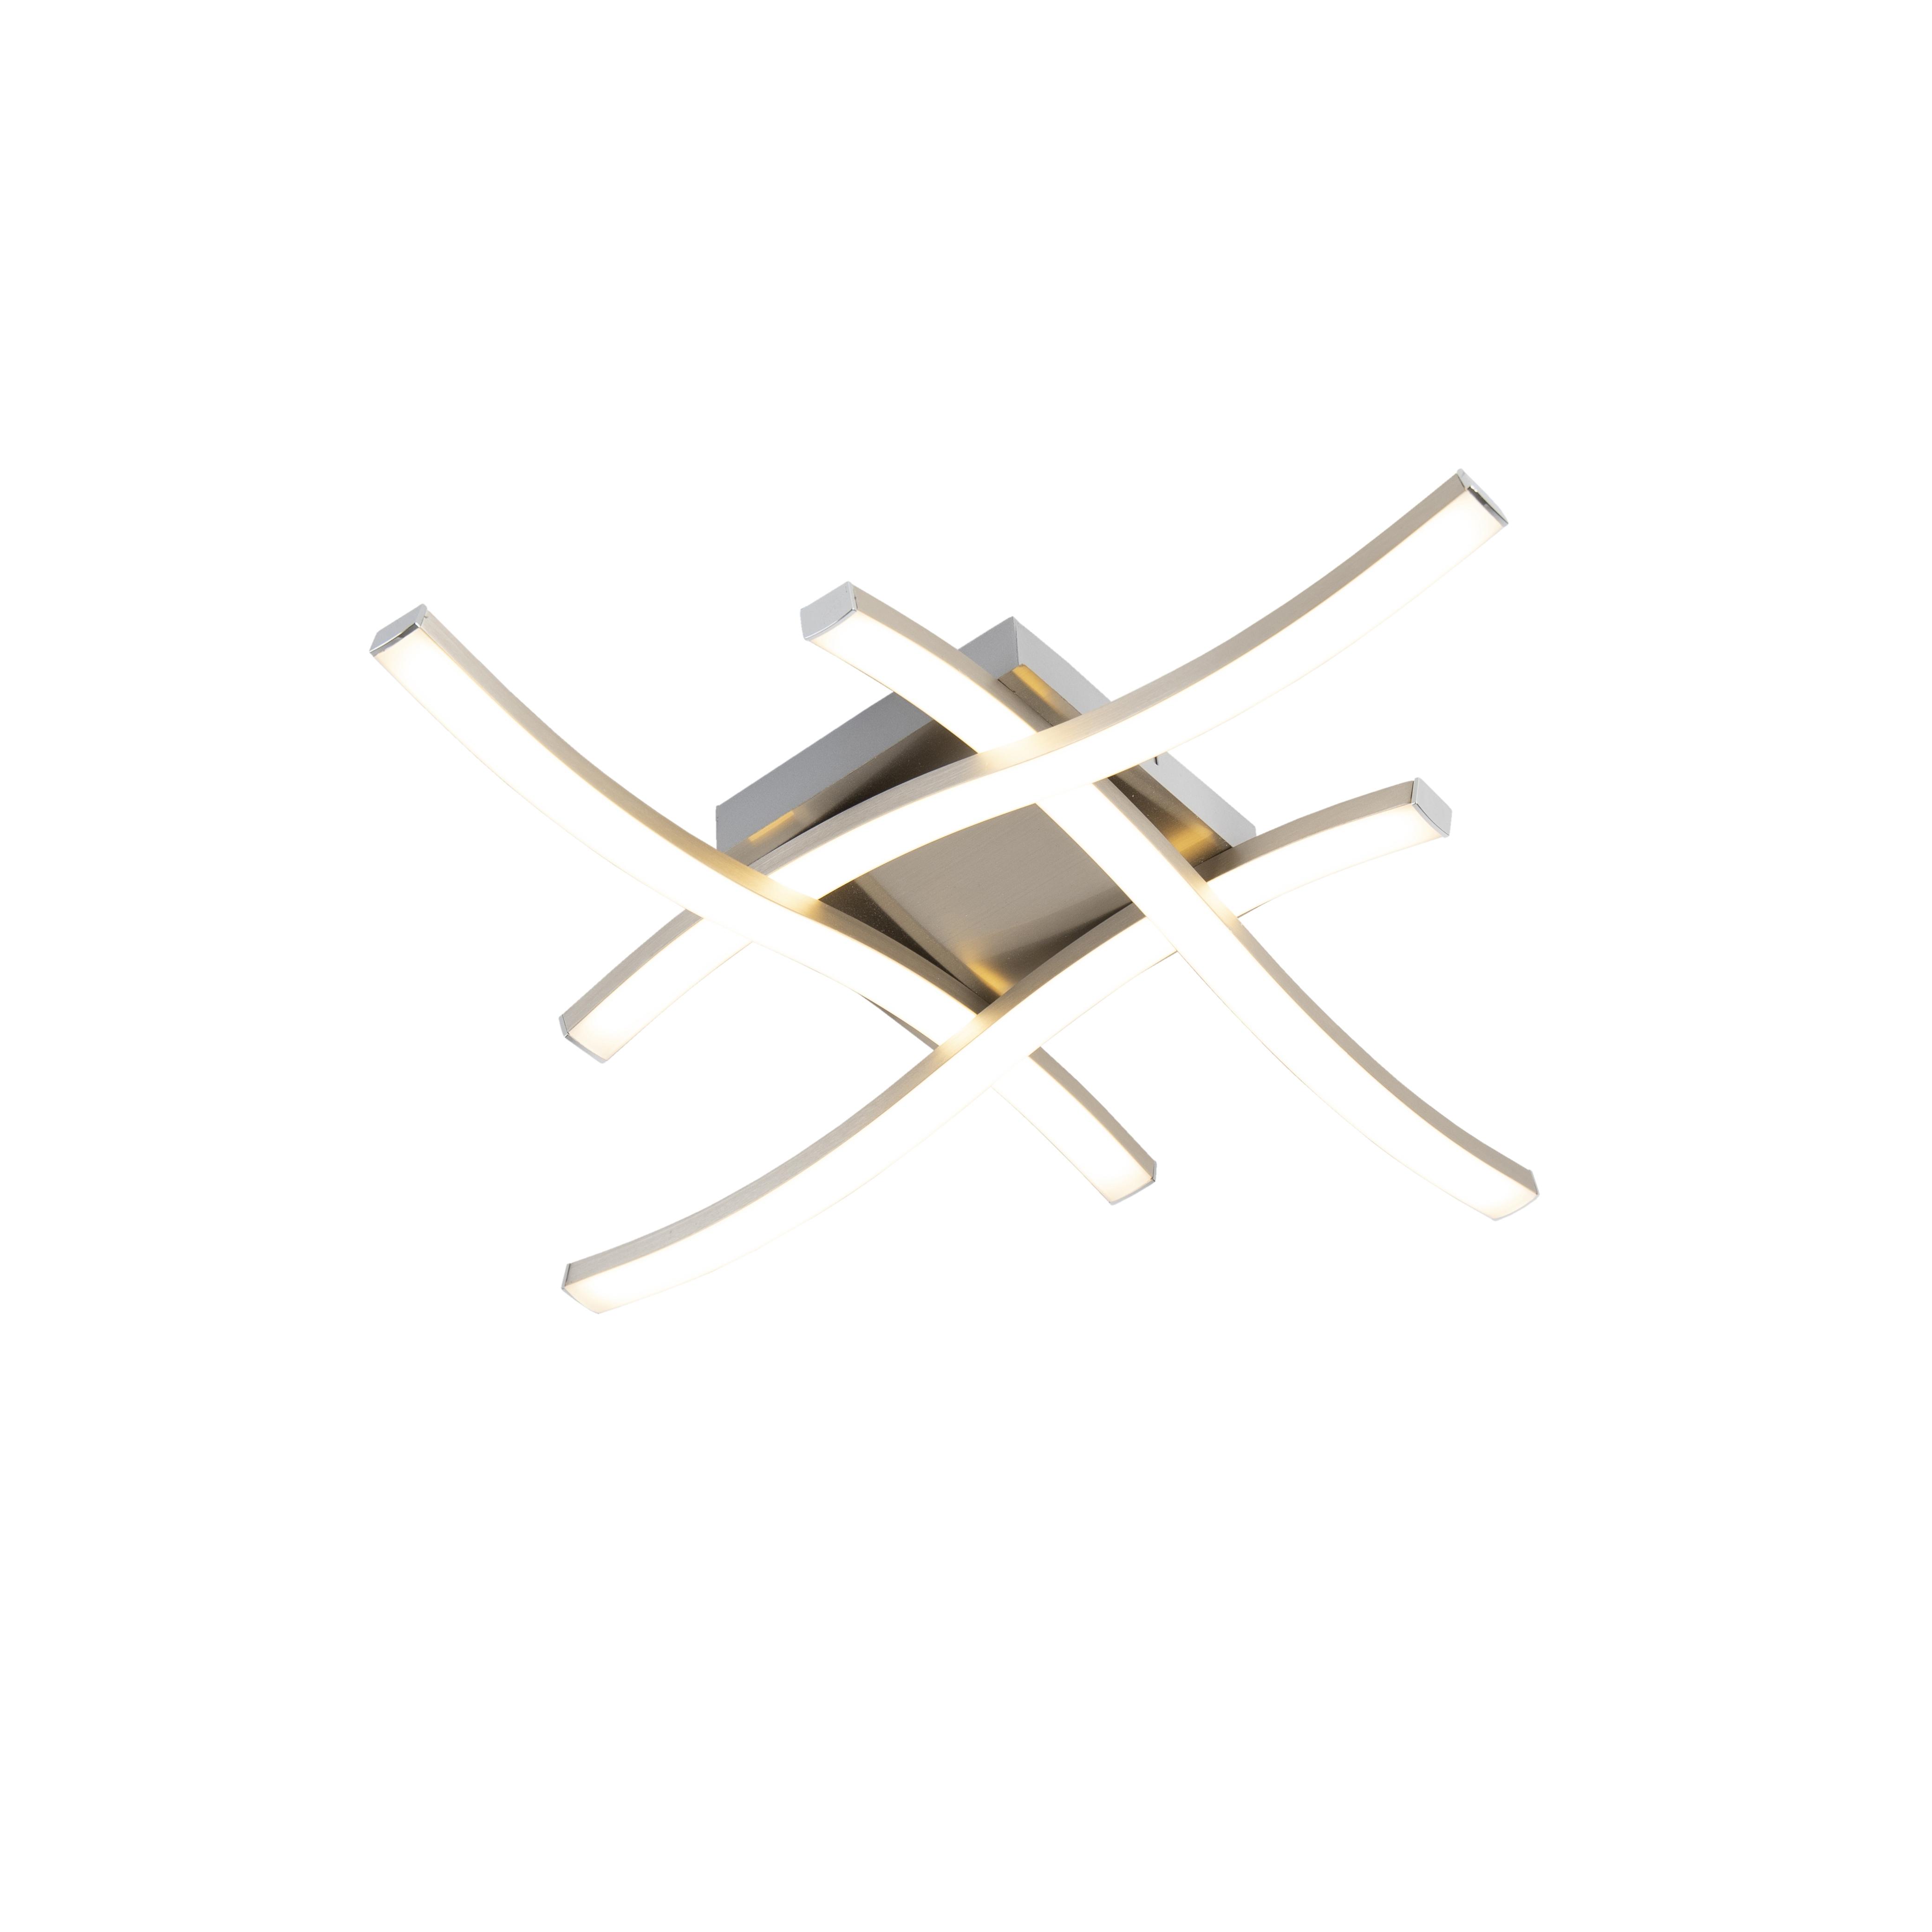 Design vierkante plafondlamp staal incl. LED - Onda